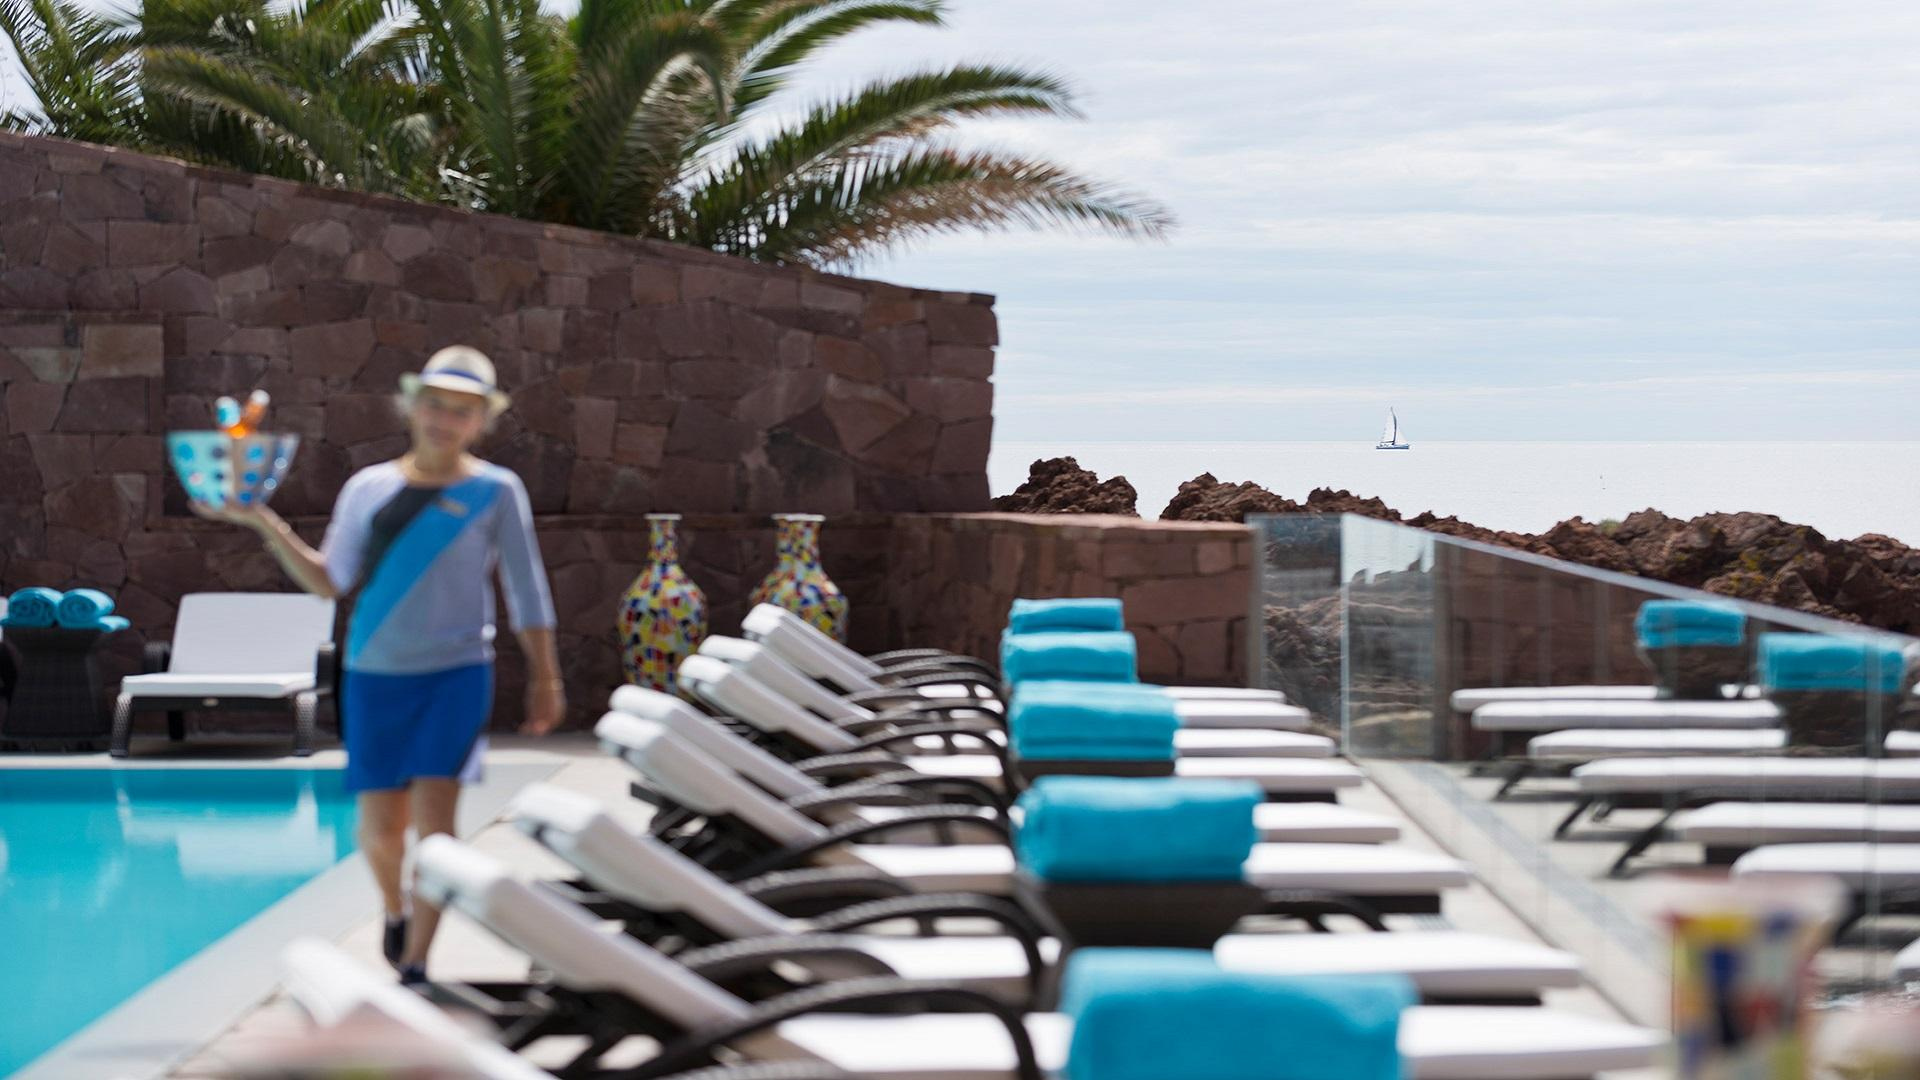 tiara-miramar-beach-hotel-spa-cote-d-azur-cannes-sud-seminaires-de-caractere